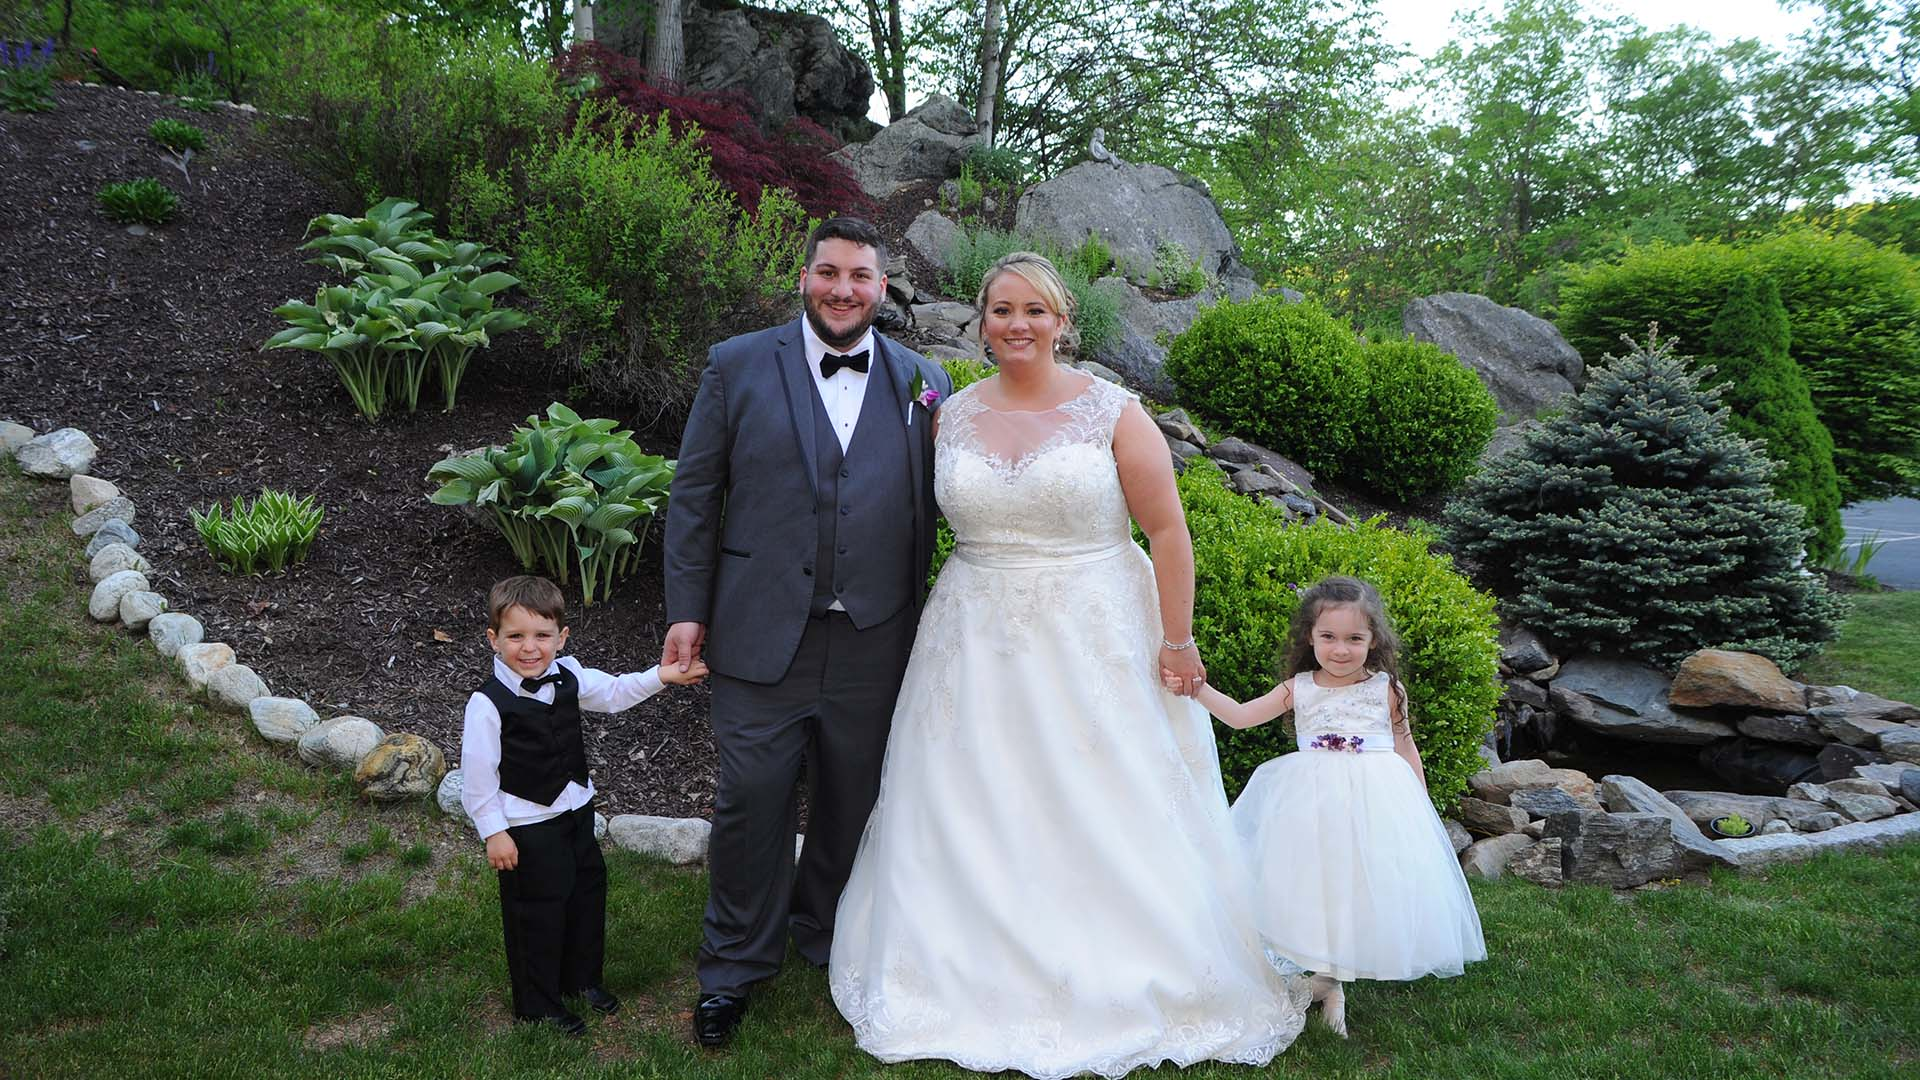 Portrait of Landscape at Wedding